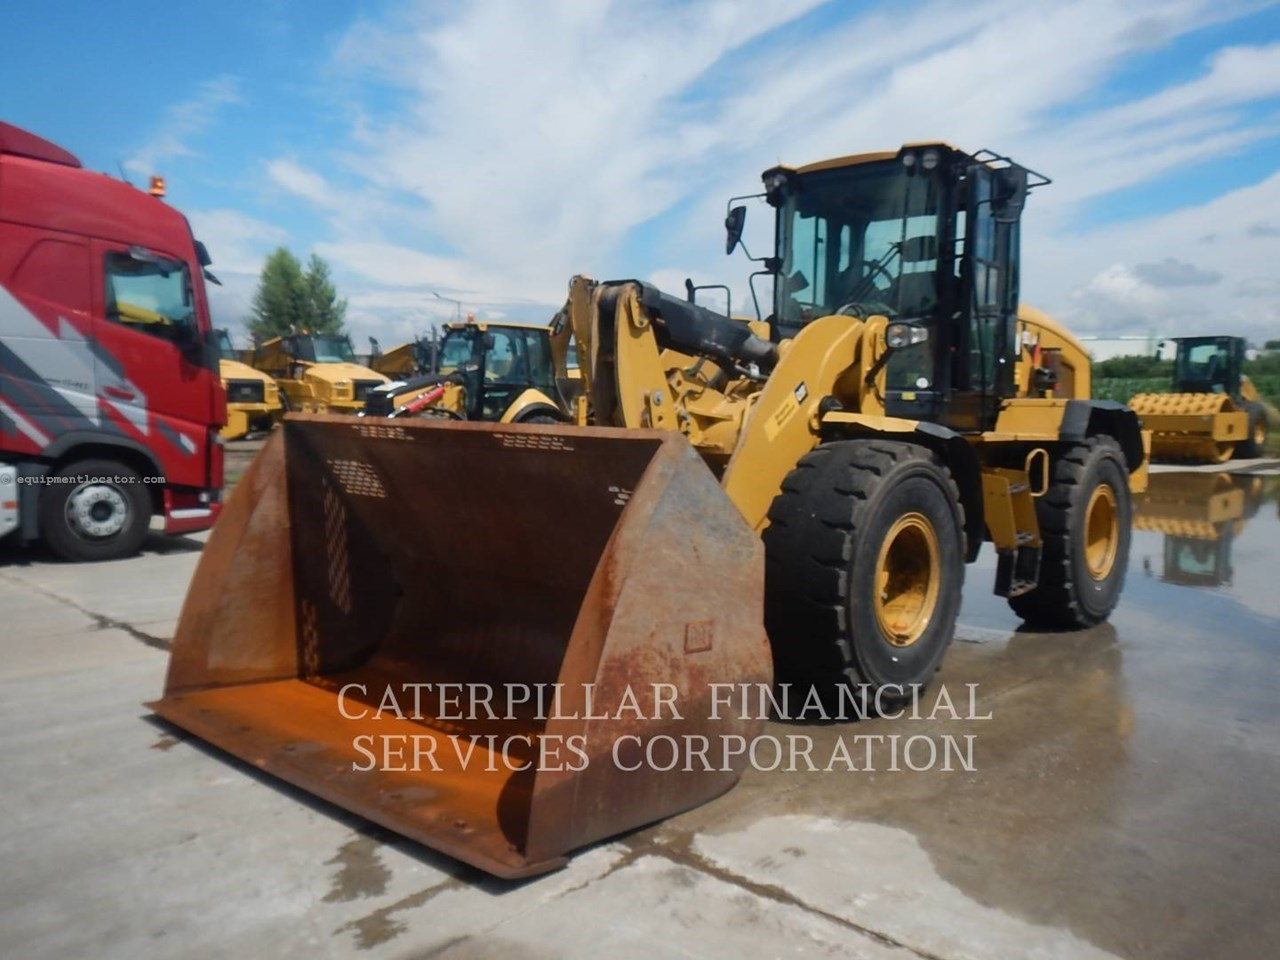 2017 Caterpillar 938M Image 1